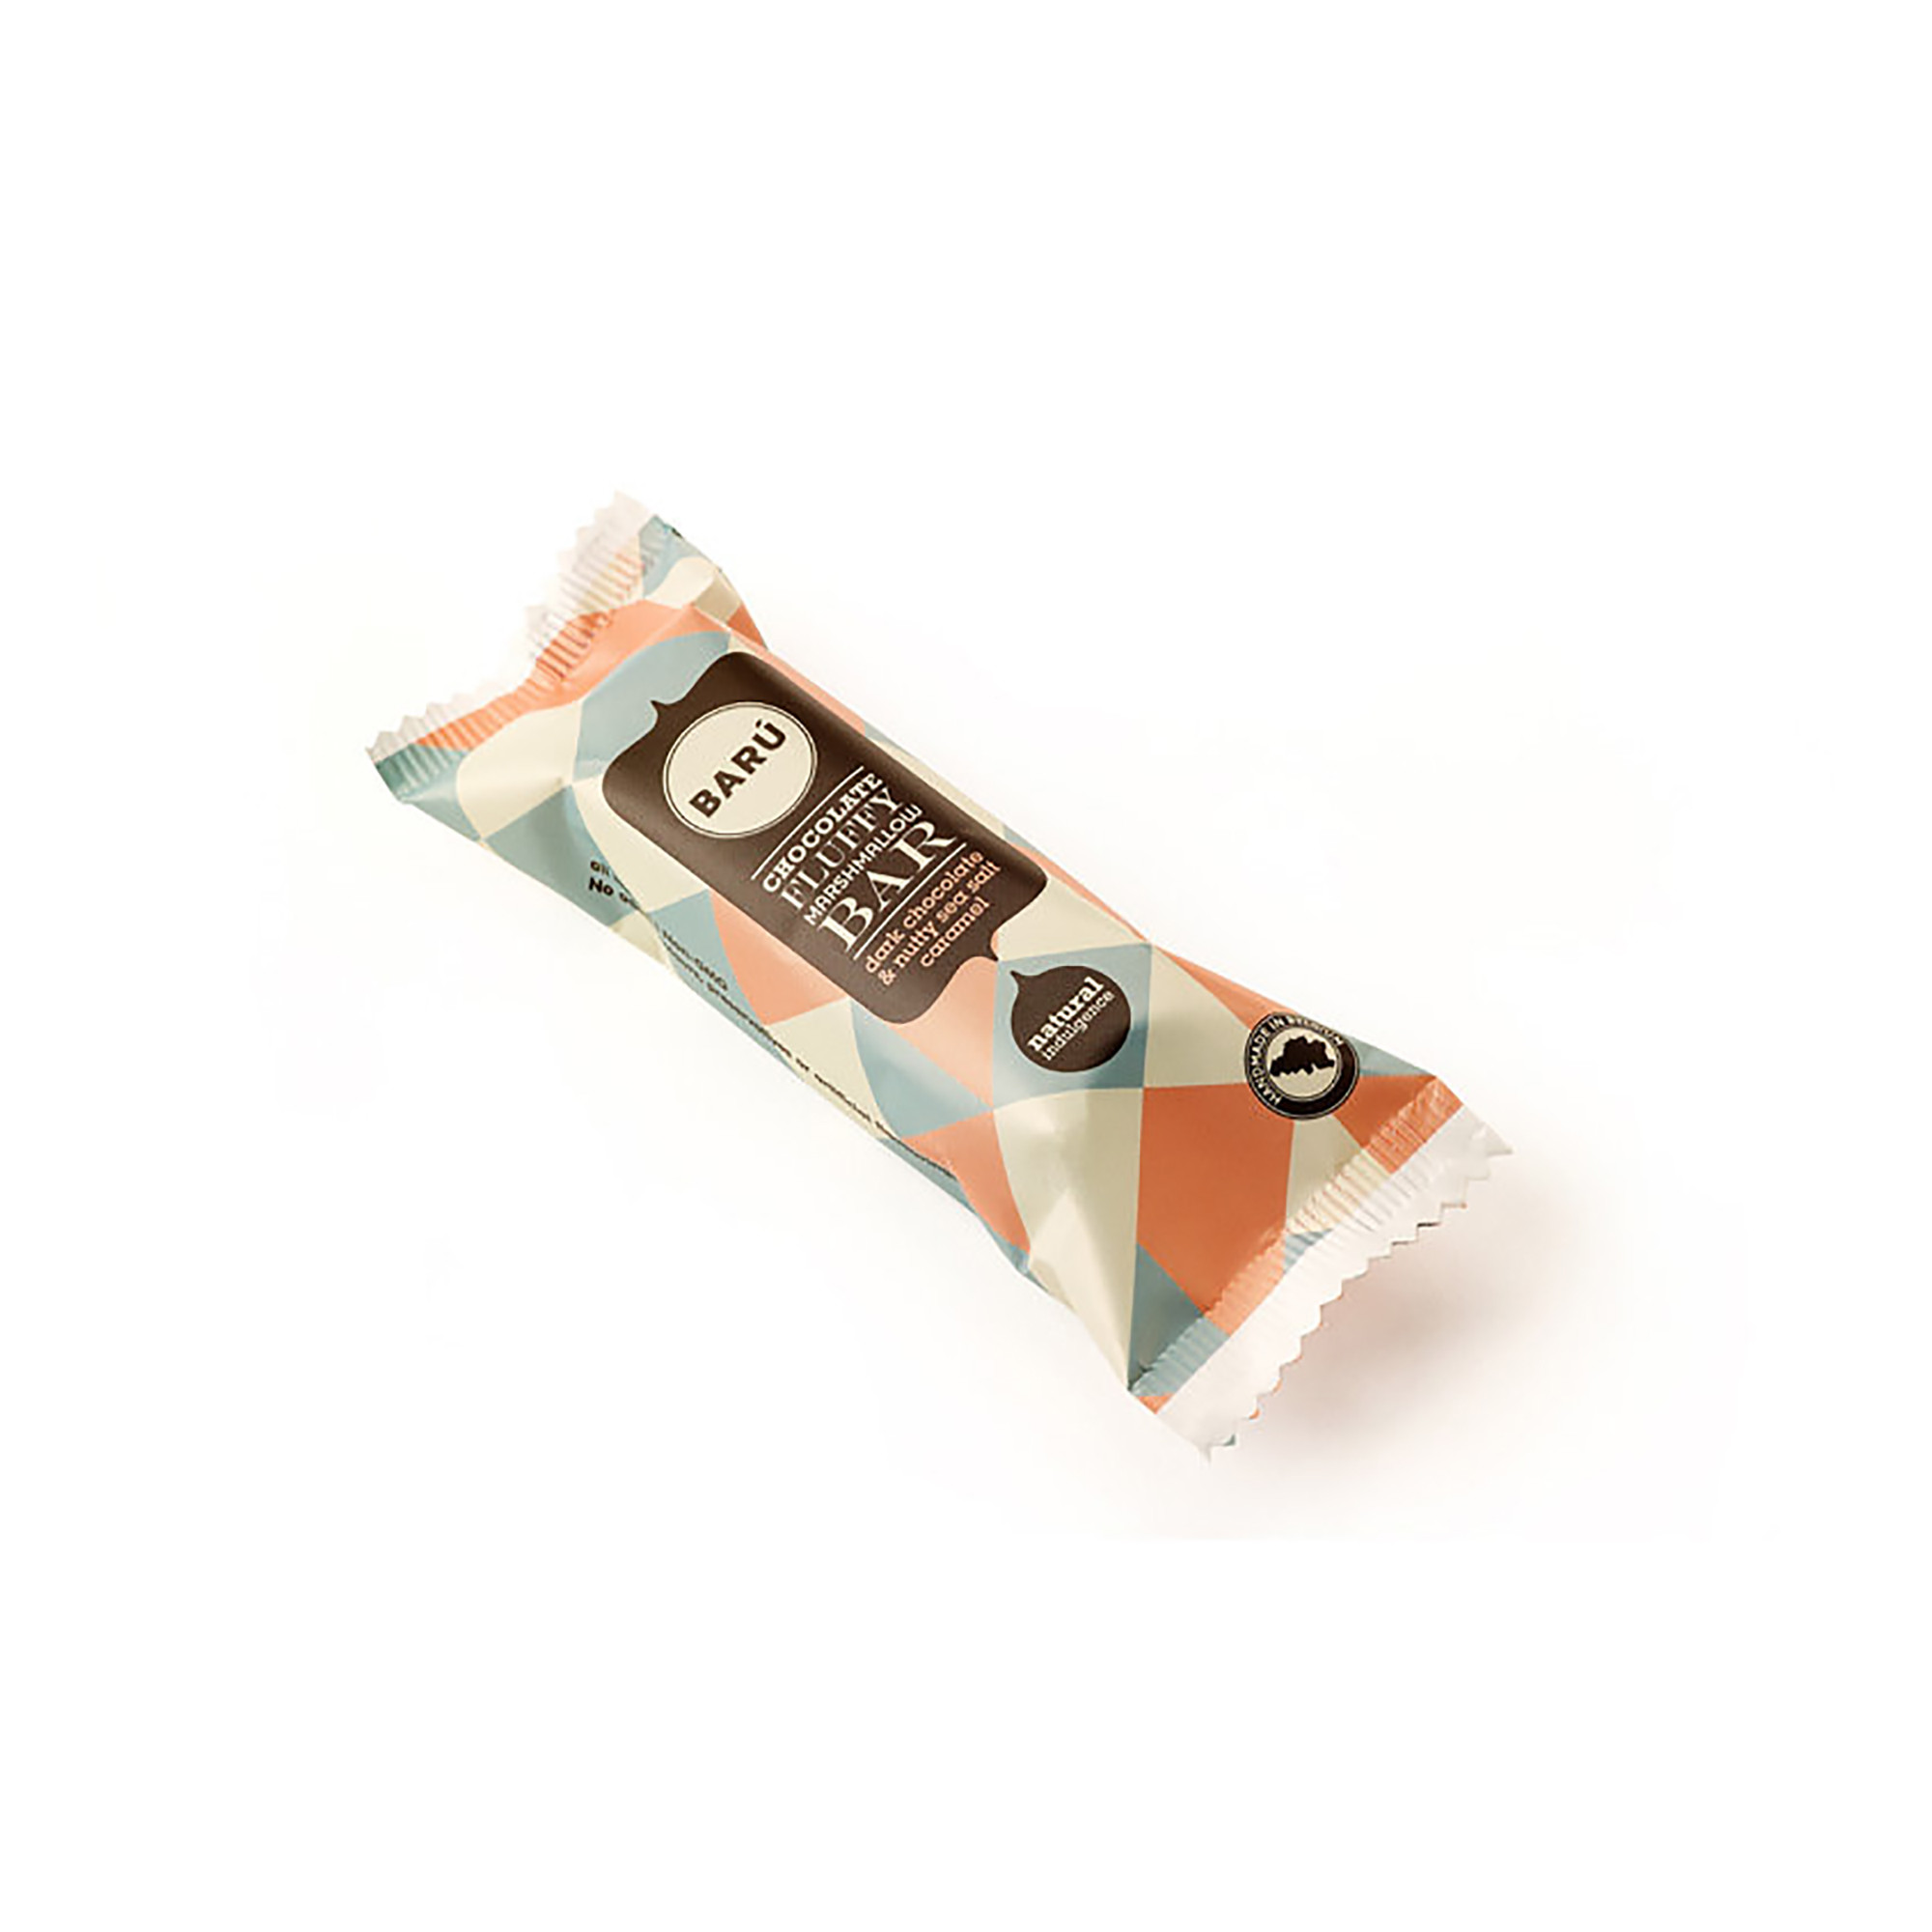 Image of Dark Chocolate & Nutty Seasalt Caramel Bar - 30 gram